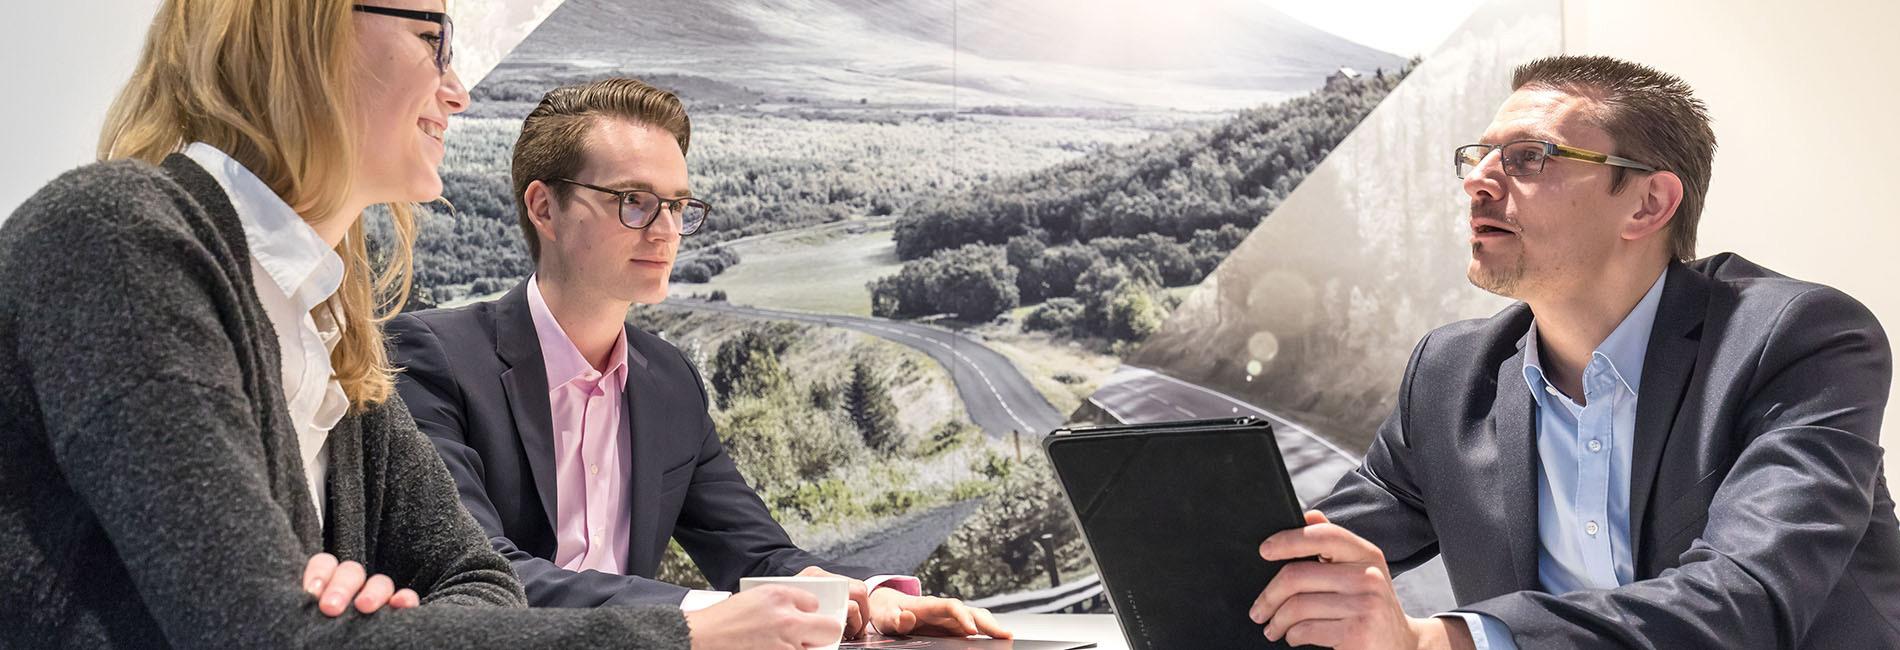 neuwagen schmidt hoffmann mobilit t. Black Bedroom Furniture Sets. Home Design Ideas